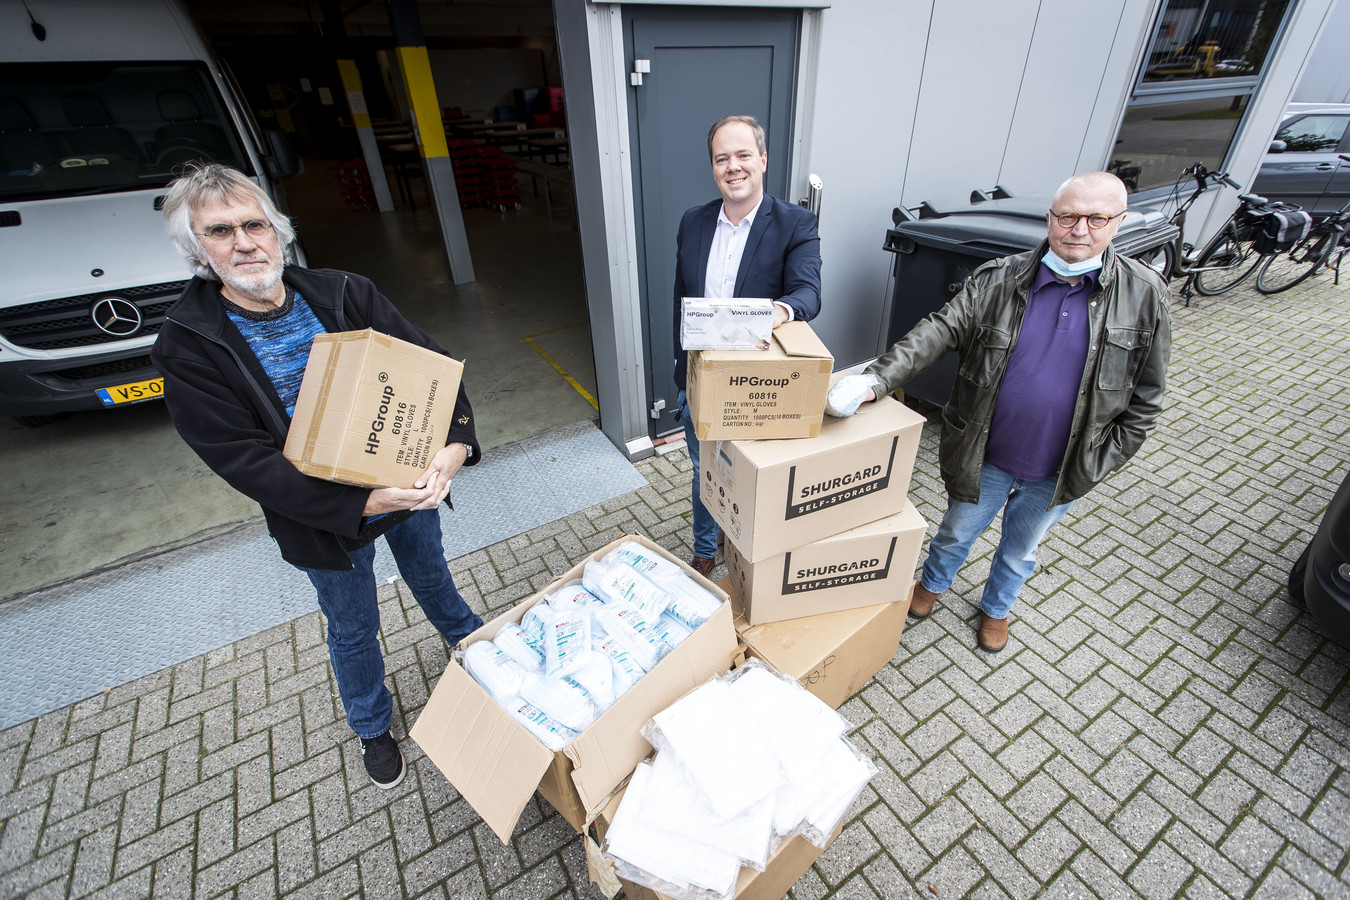 De voedselbank Oost-Achterhoek kreeg vorig jaar 10.000 mondkapjes van FC Twente fanclub Hardcore Eibergen. v.l.n.r. Henk Kok (voorzitter voedselbank Oost Achterhoek) , Jordy Geerdink (Optima Pharma, HP group) en Heinz Clasen (bestuurslid voedselbank Oost Achterhoek).